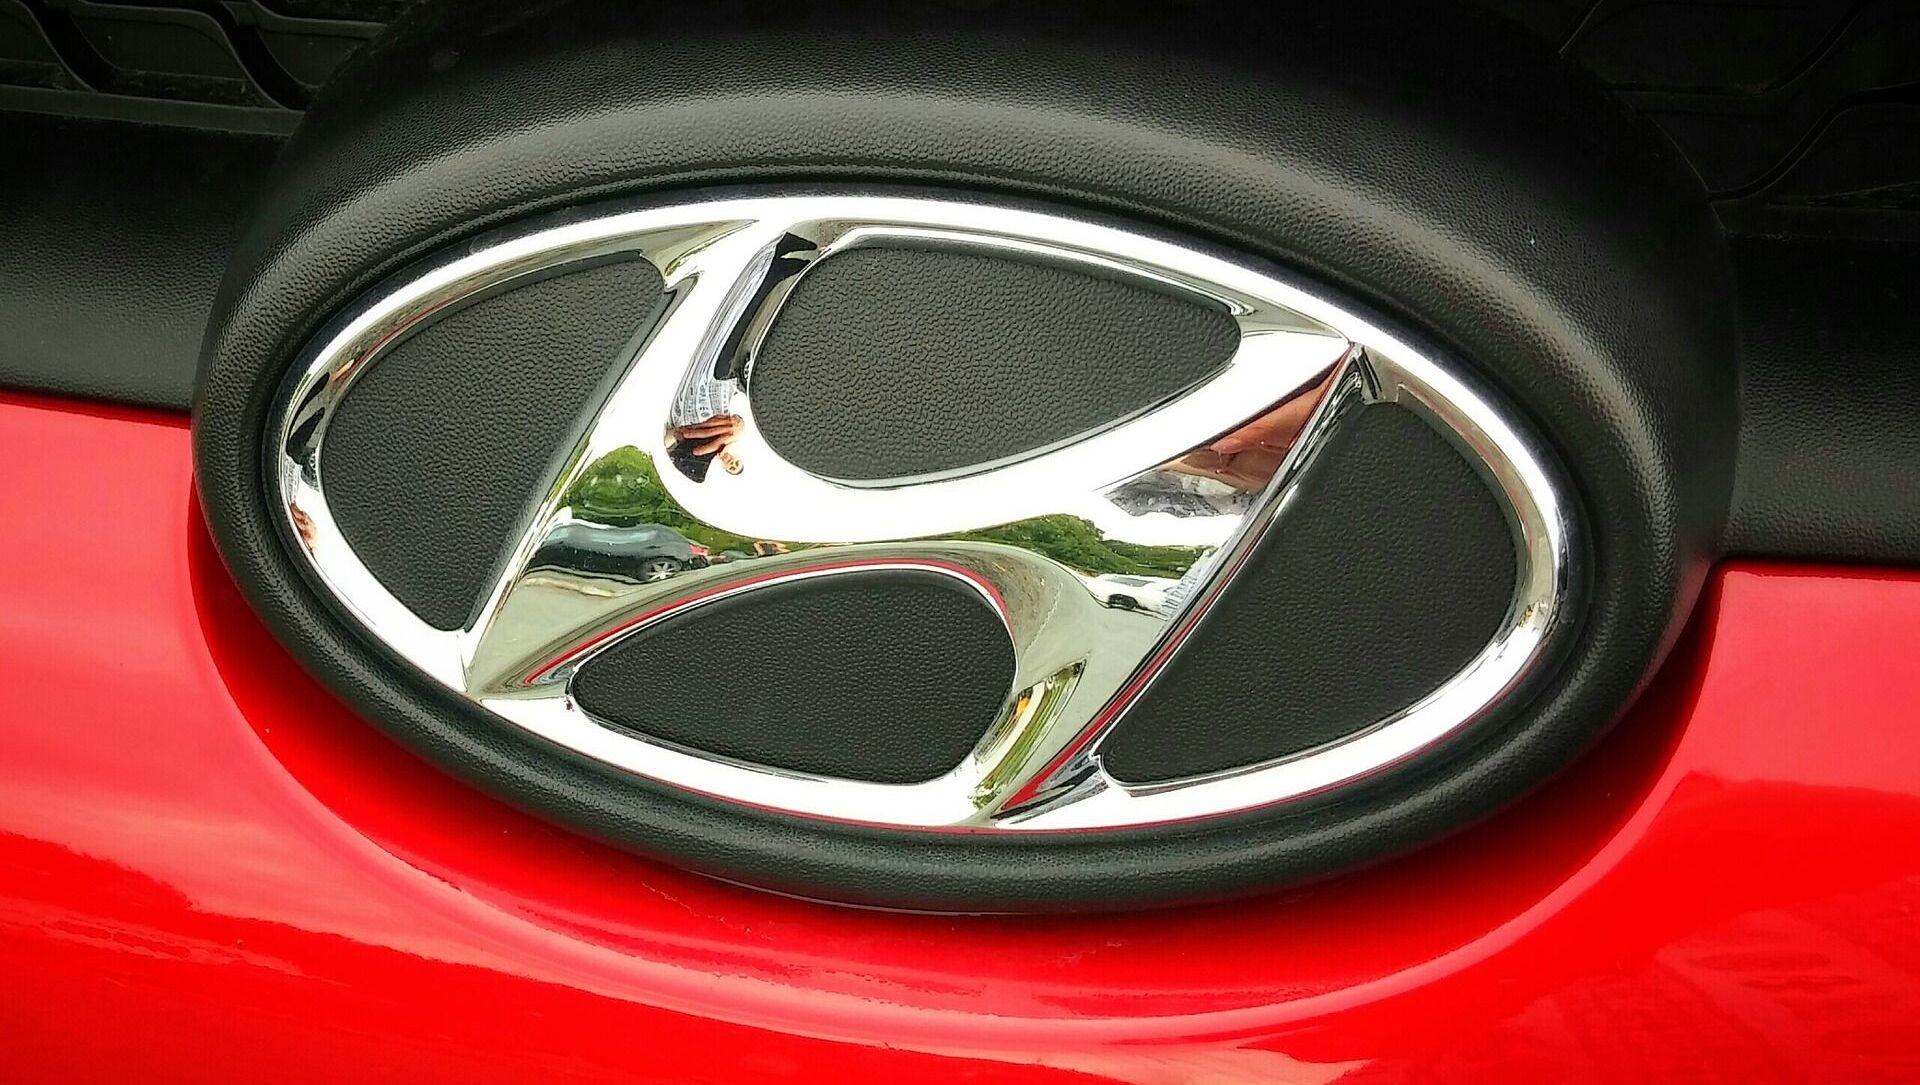 Le logo de Hyundai - Sputnik France, 1920, 13.08.2021